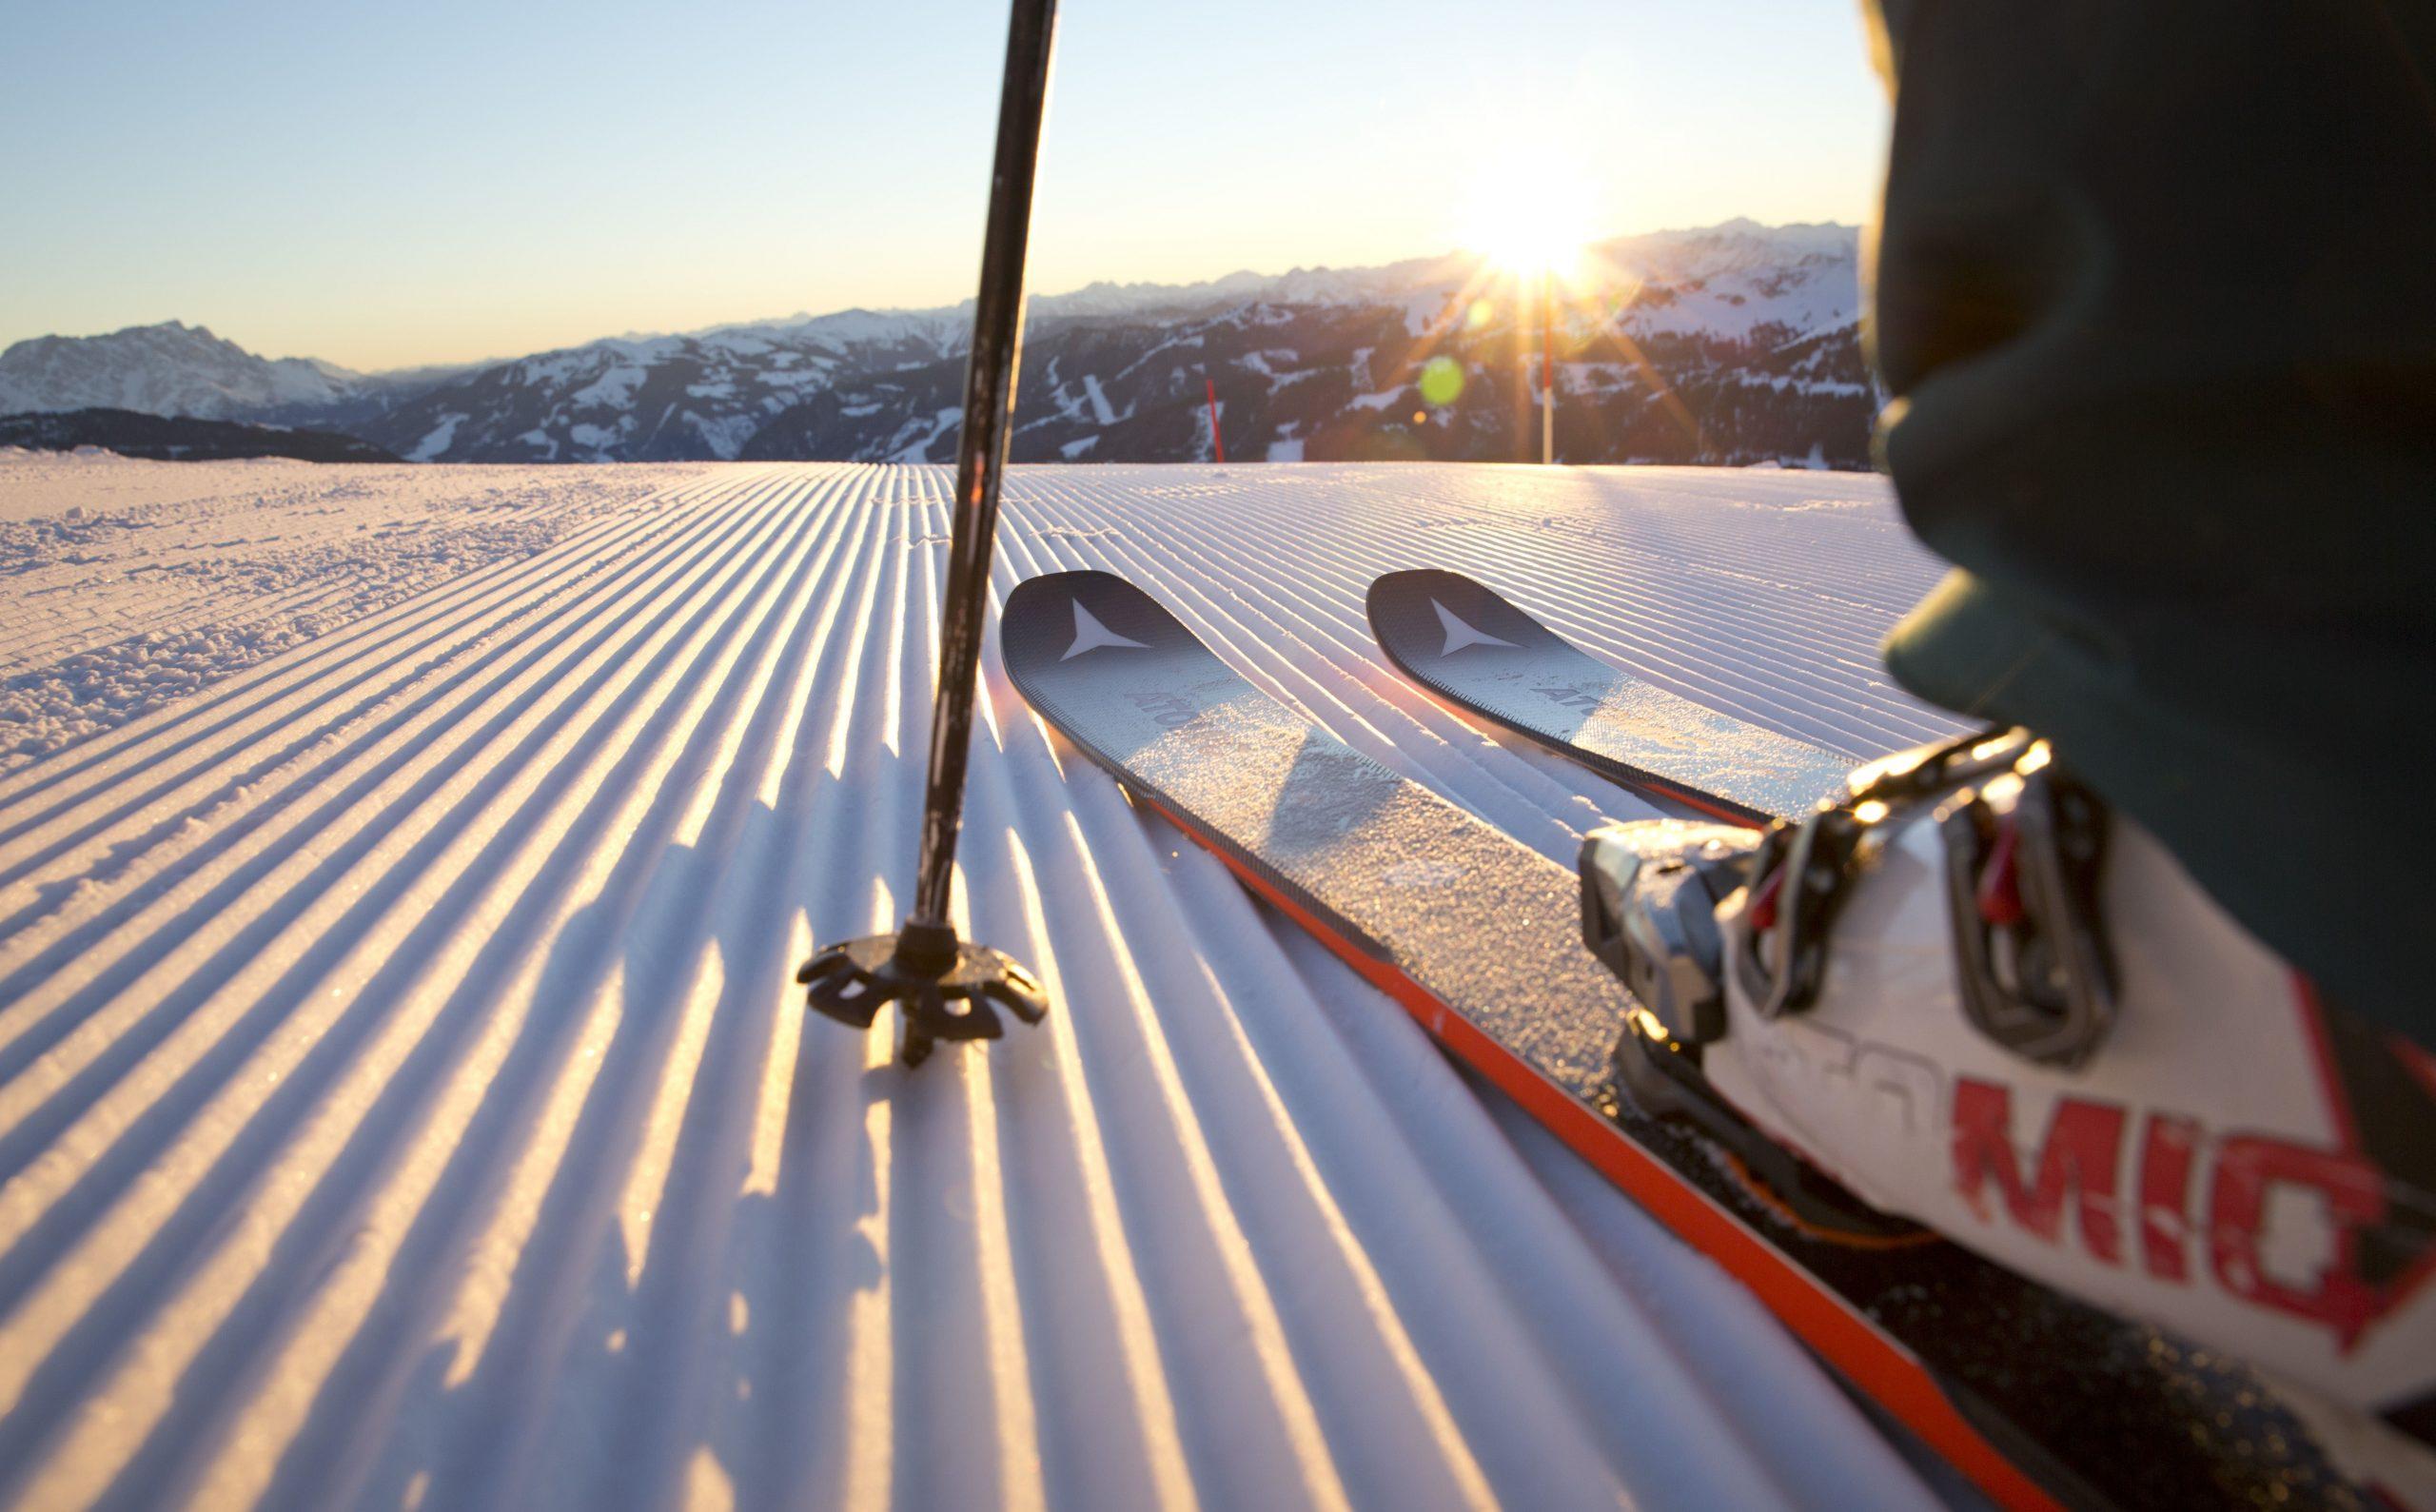 Skiabfahrt in Saalbach-Hinterglemm